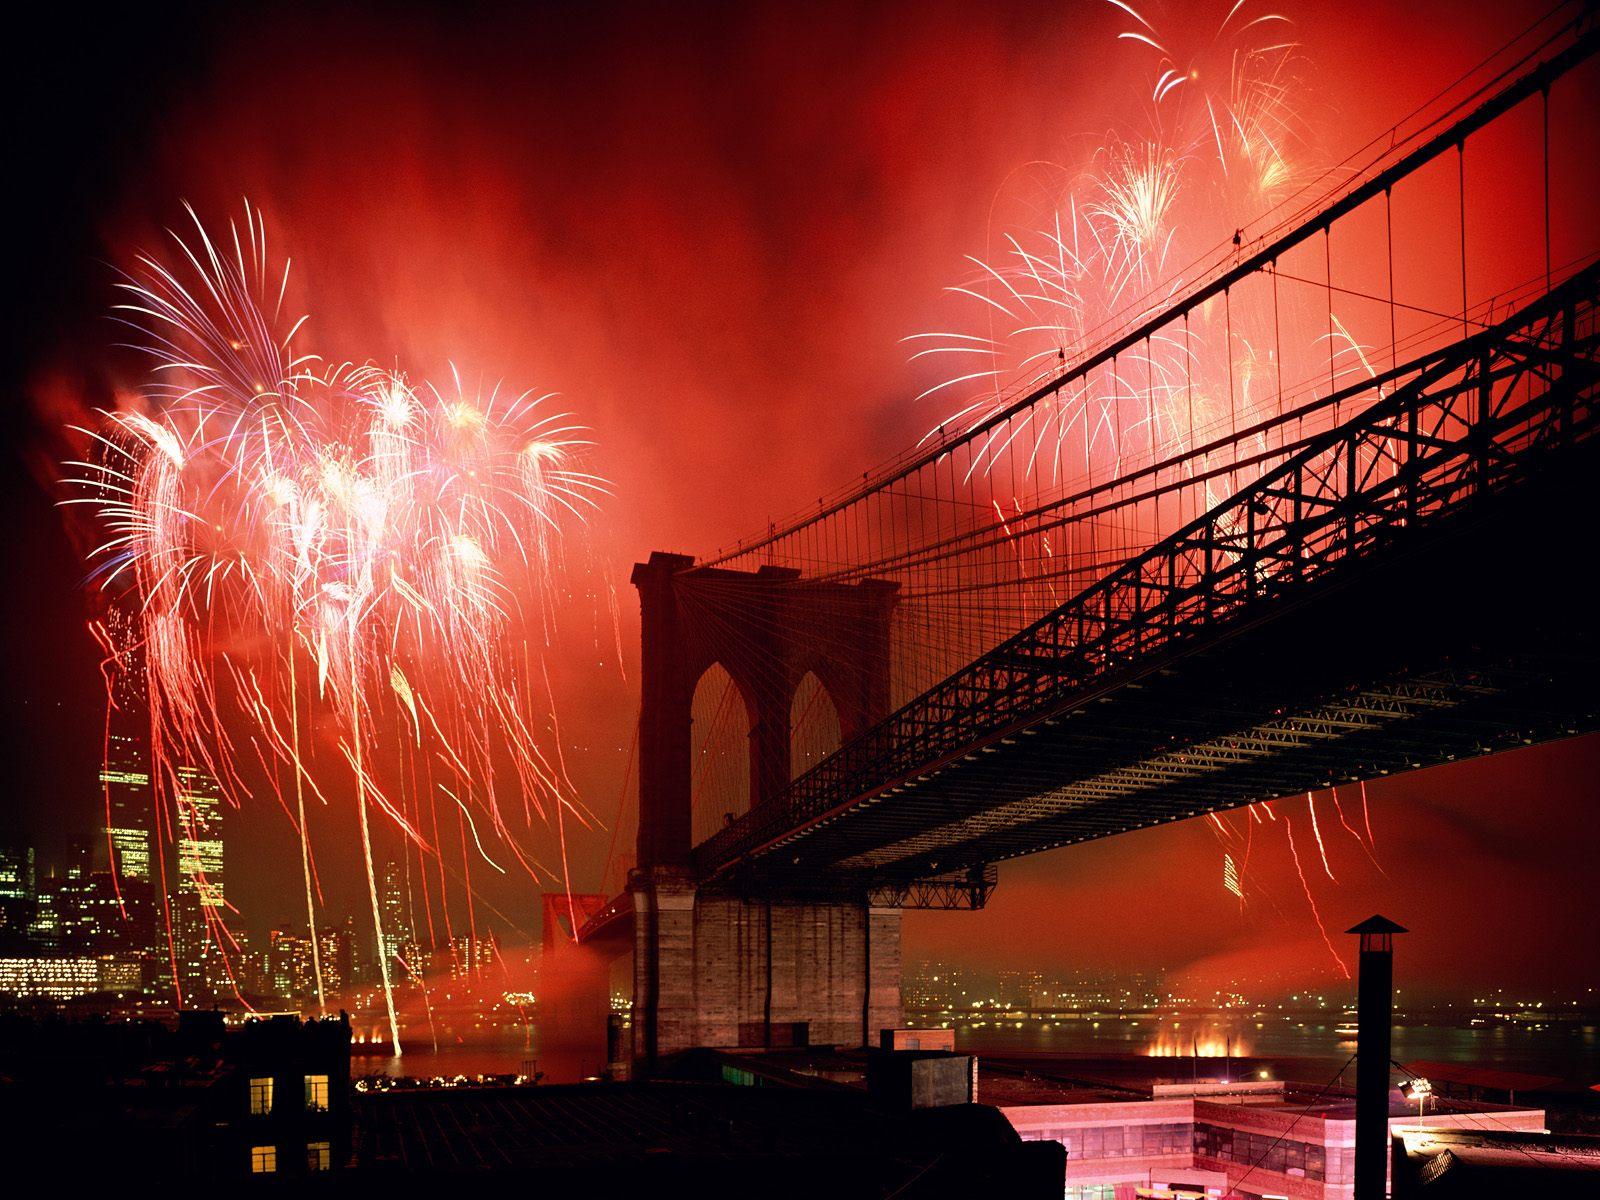 http://2.bp.blogspot.com/_eg4RyNmPMYM/TScBaFswU-I/AAAAAAAAMsU/St4NFN7KNjY/s1600/Celebration-Brooklyn-Bridge-New-York-City.jpg